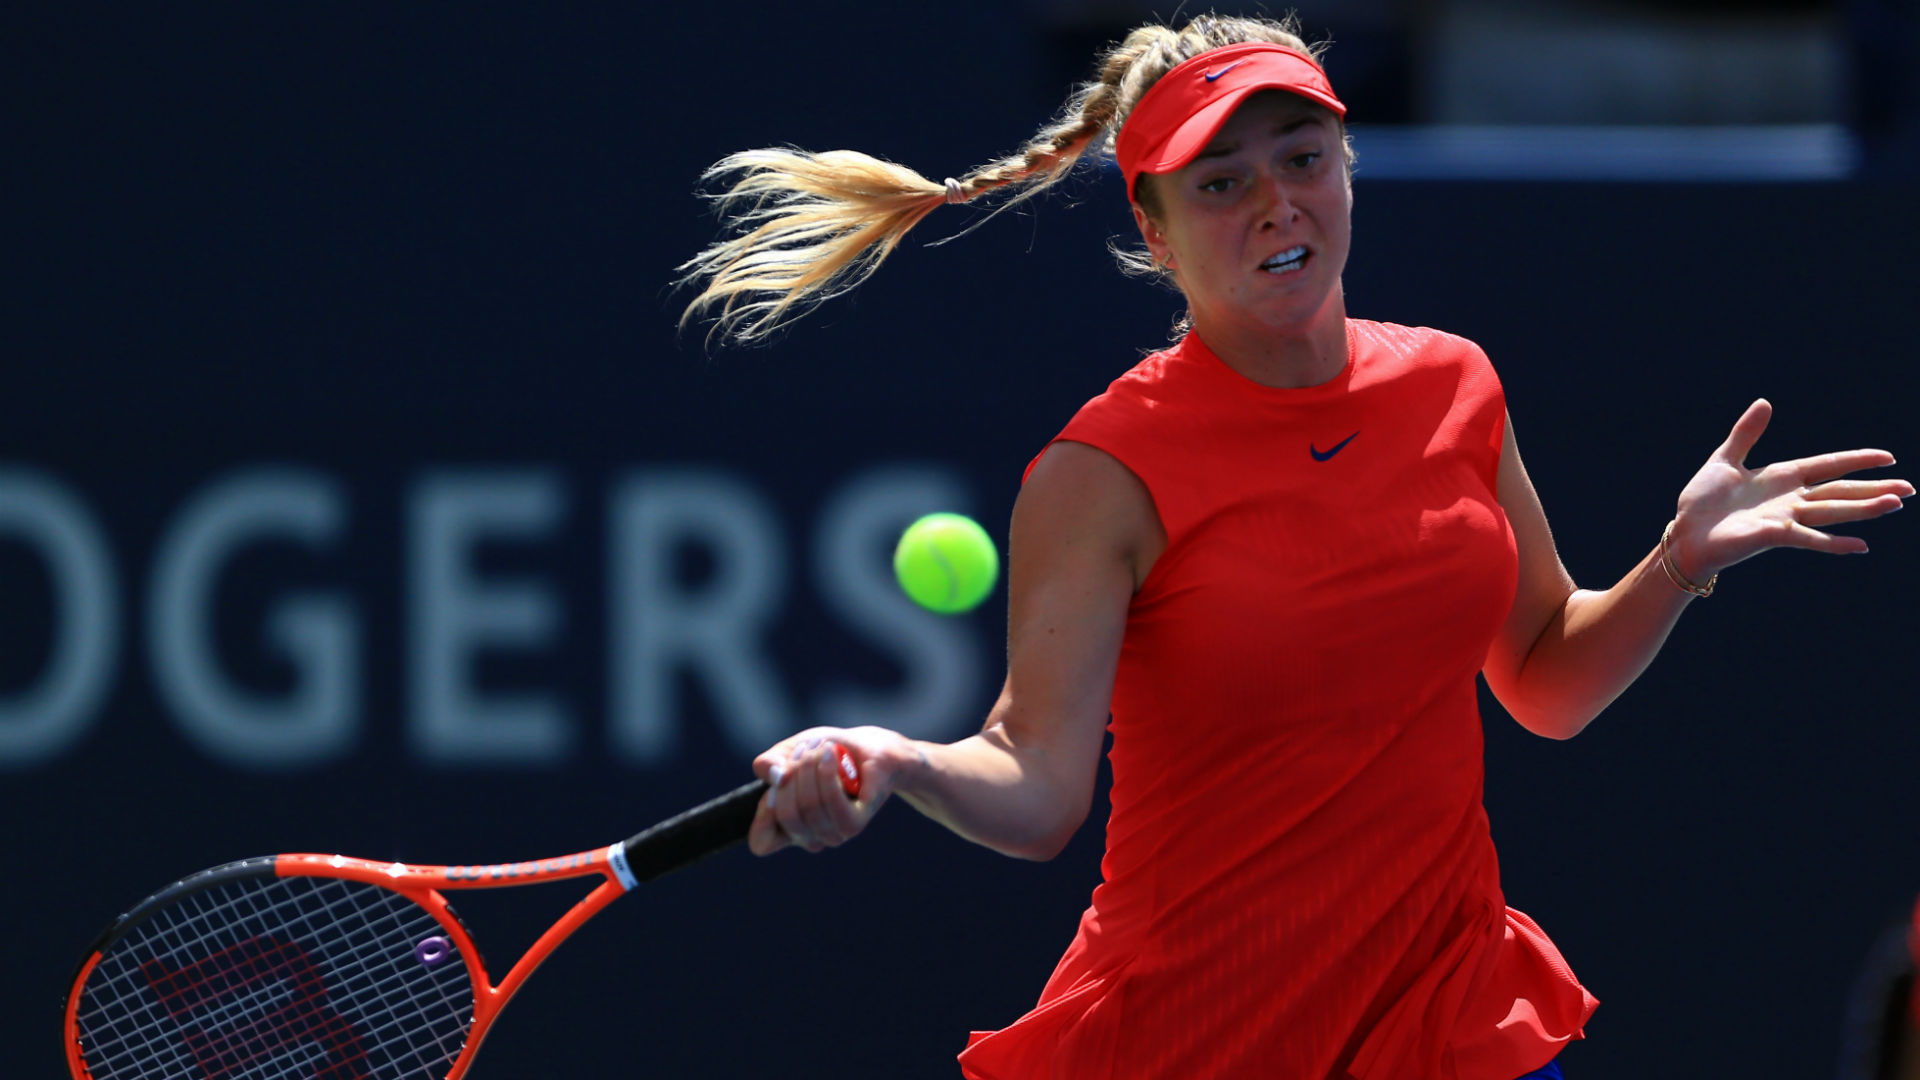 Rogers Cup: Caroline Wozniacki beats Sloane Stephens to reach Toronto final